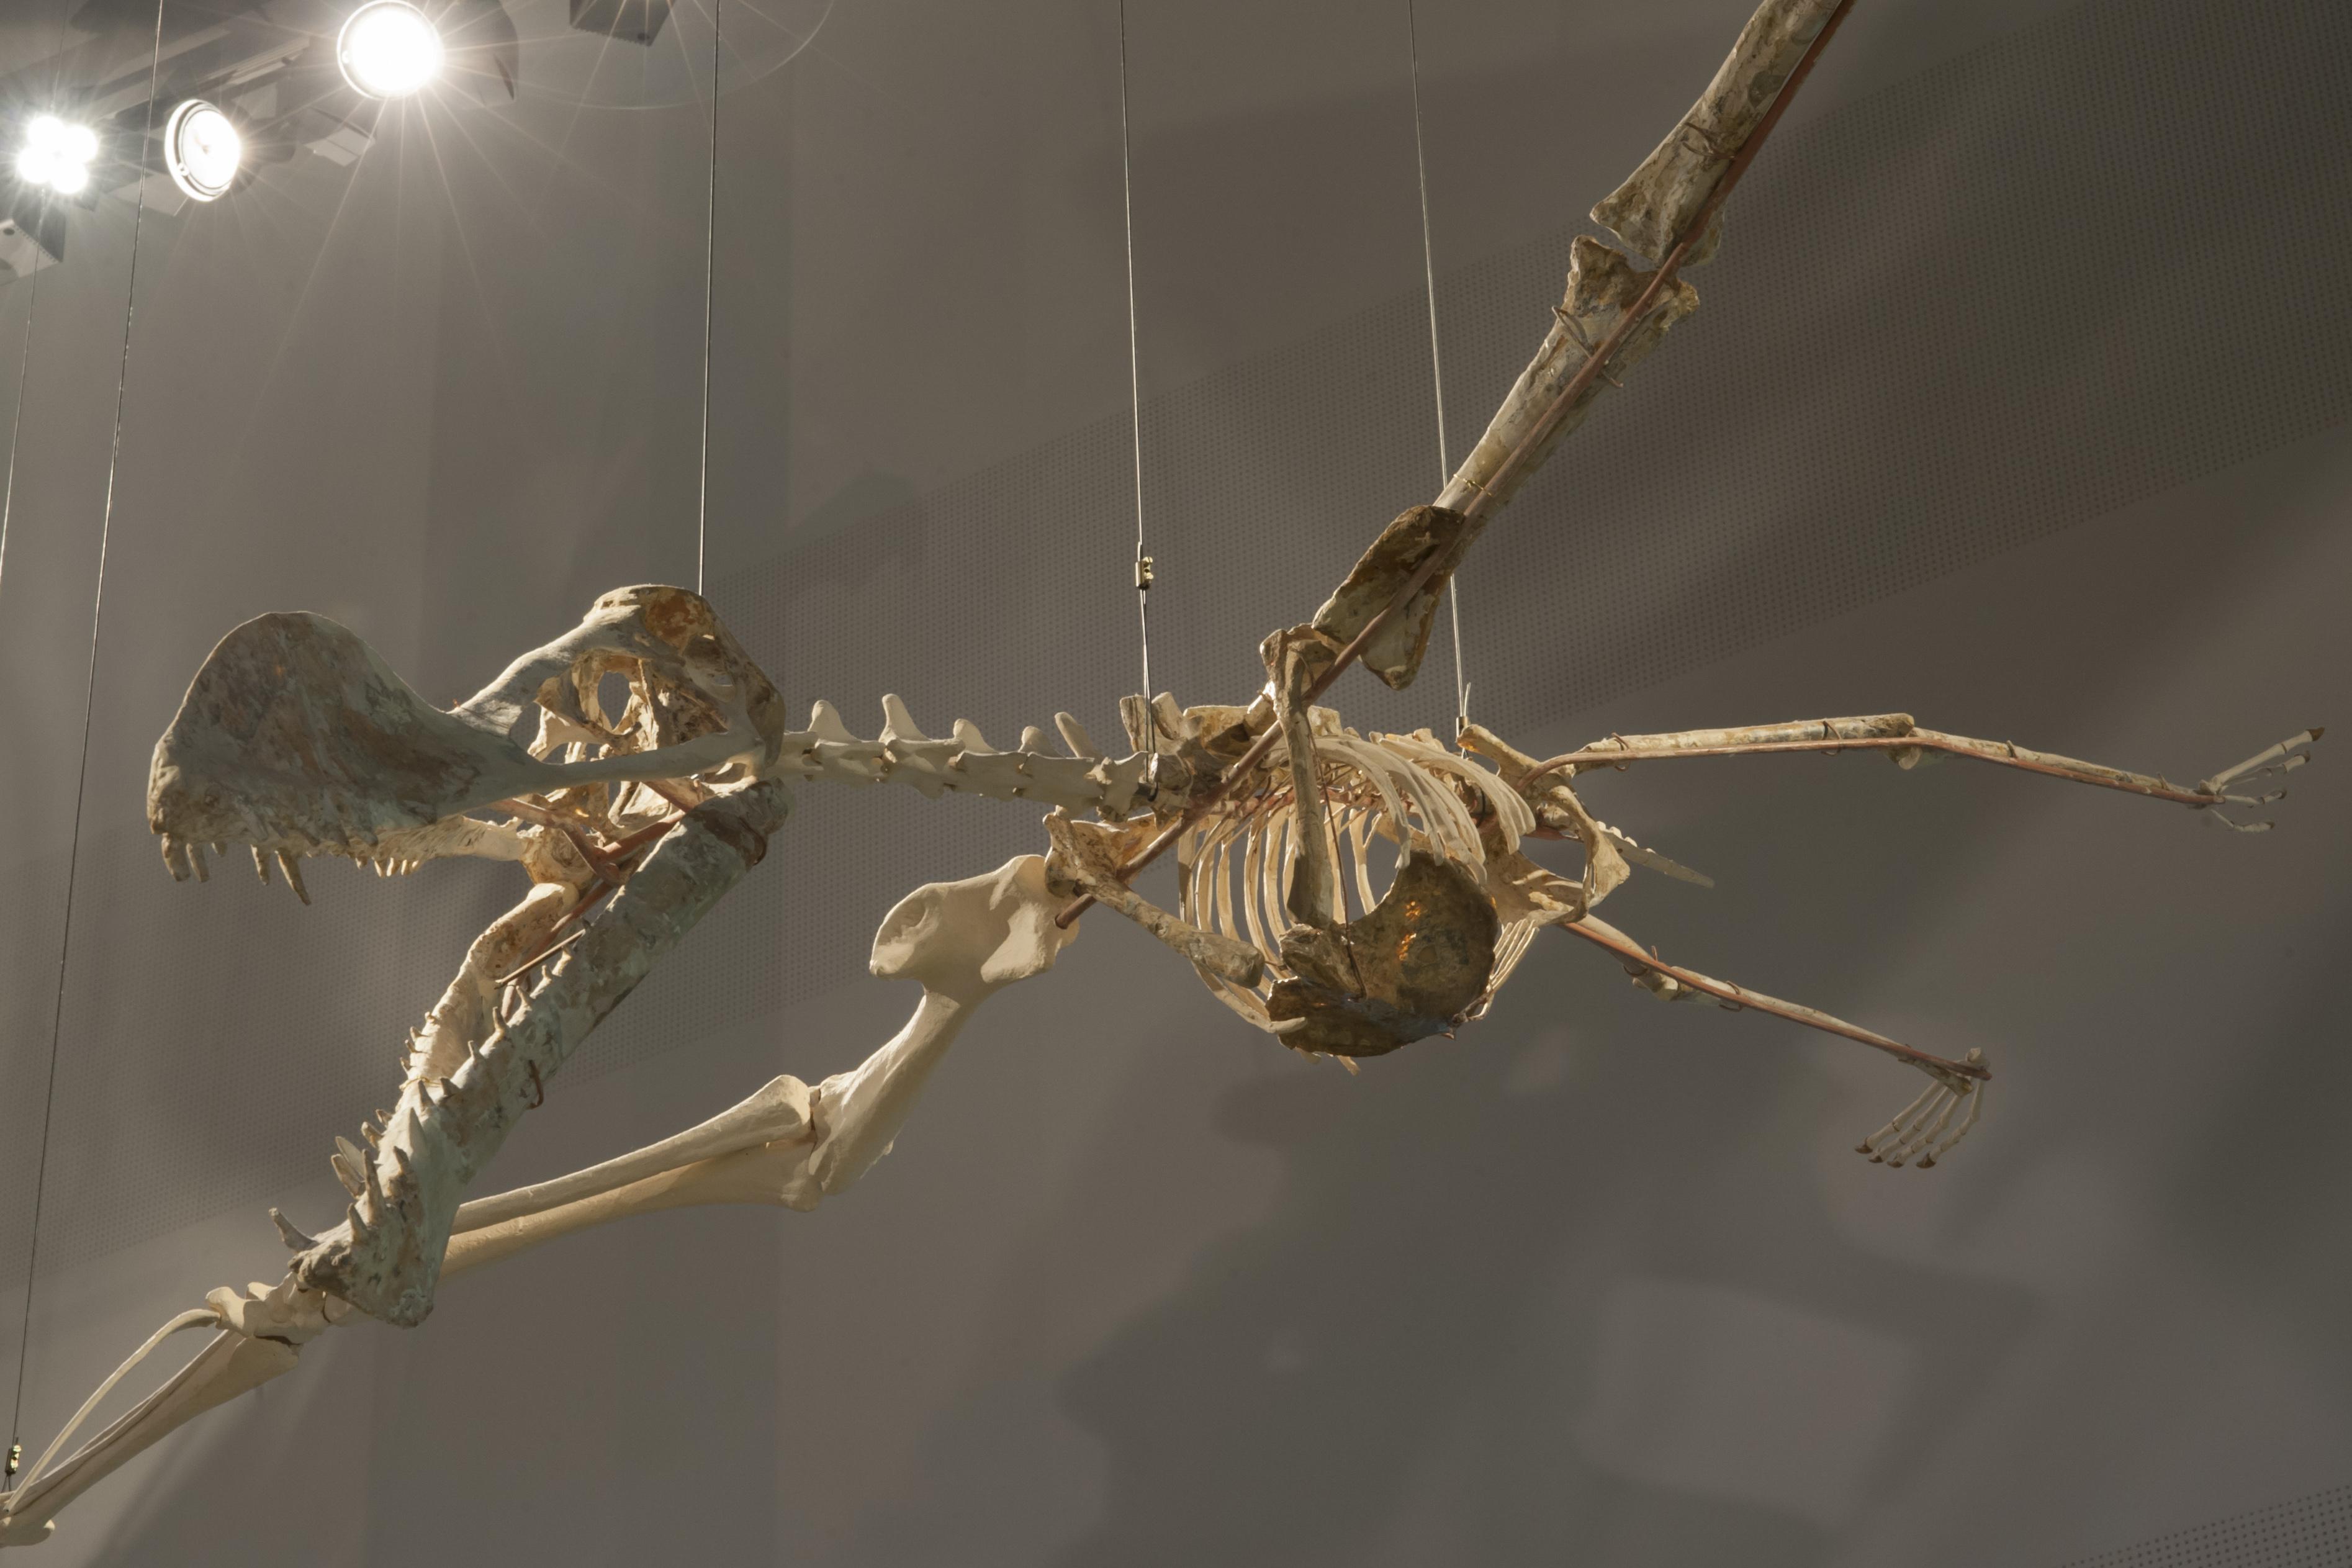 Naturalis_Biodiversity_Center_-_Museum_-_Exhibition_Primeval_parade_21_-_Flying_reptile_Coloborhynchus_spielbergi.jpg